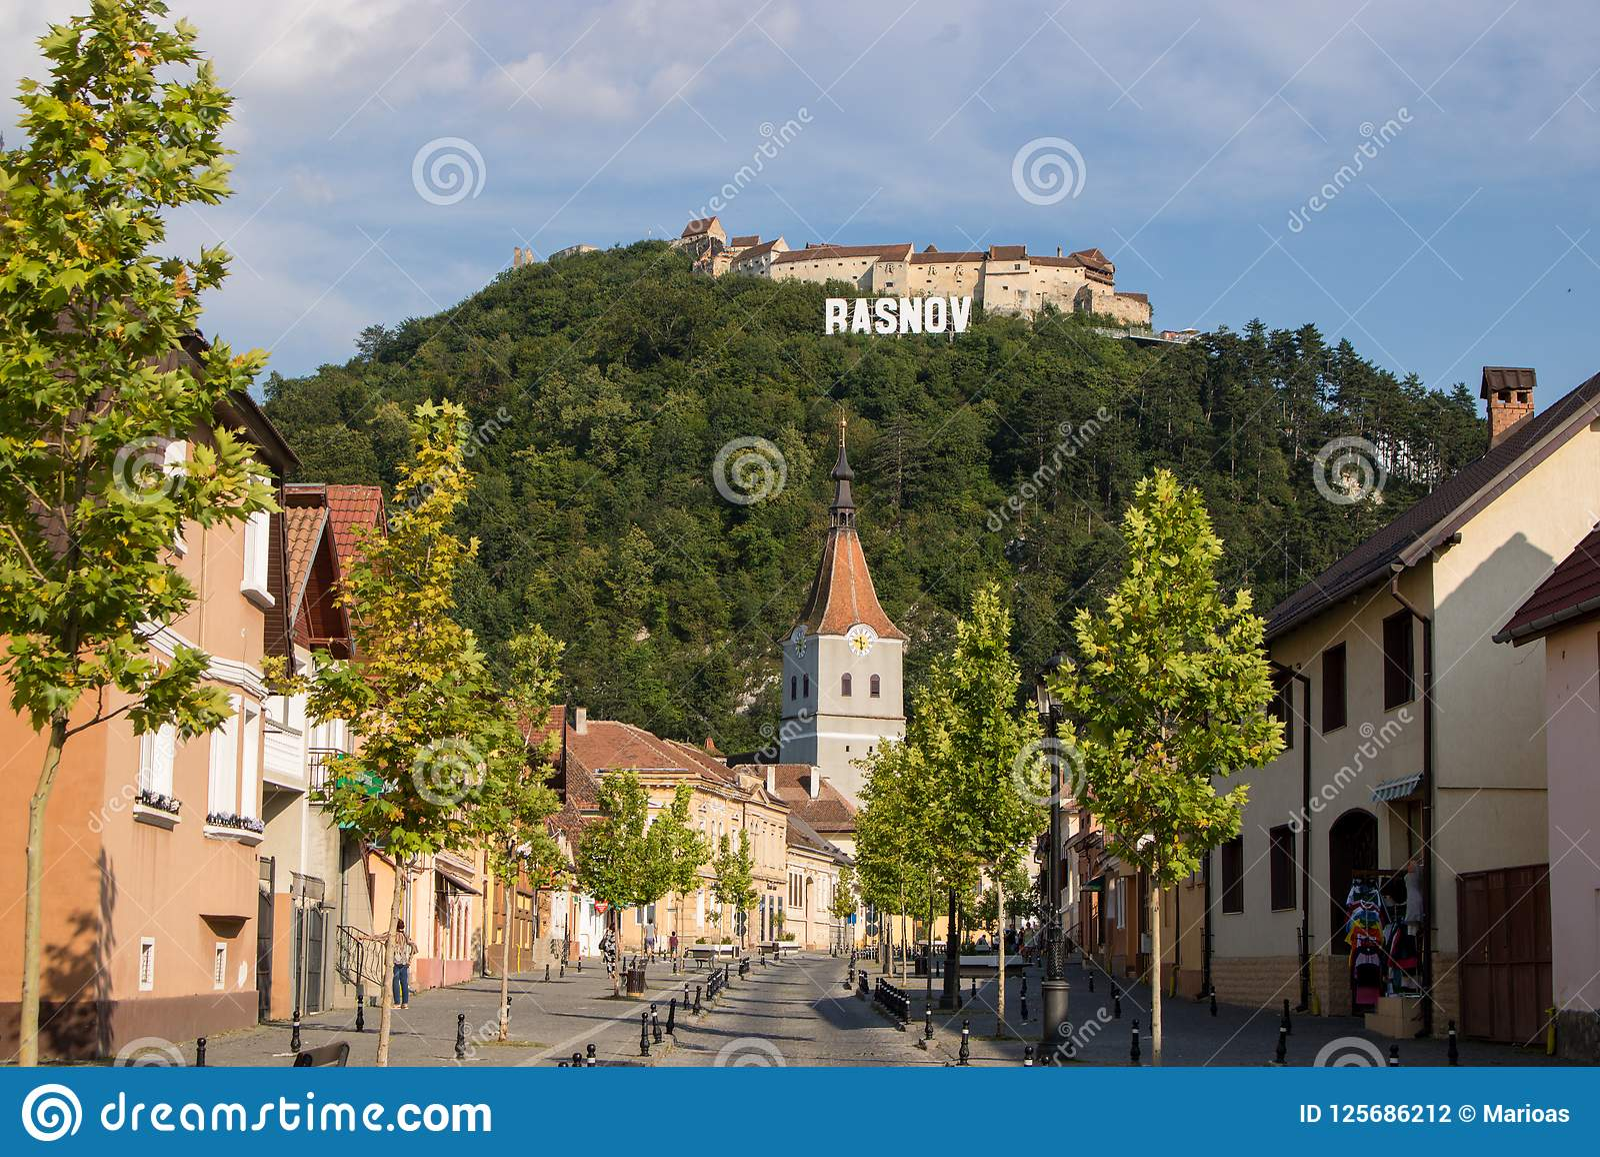 The Rasnov Fortress, Romania